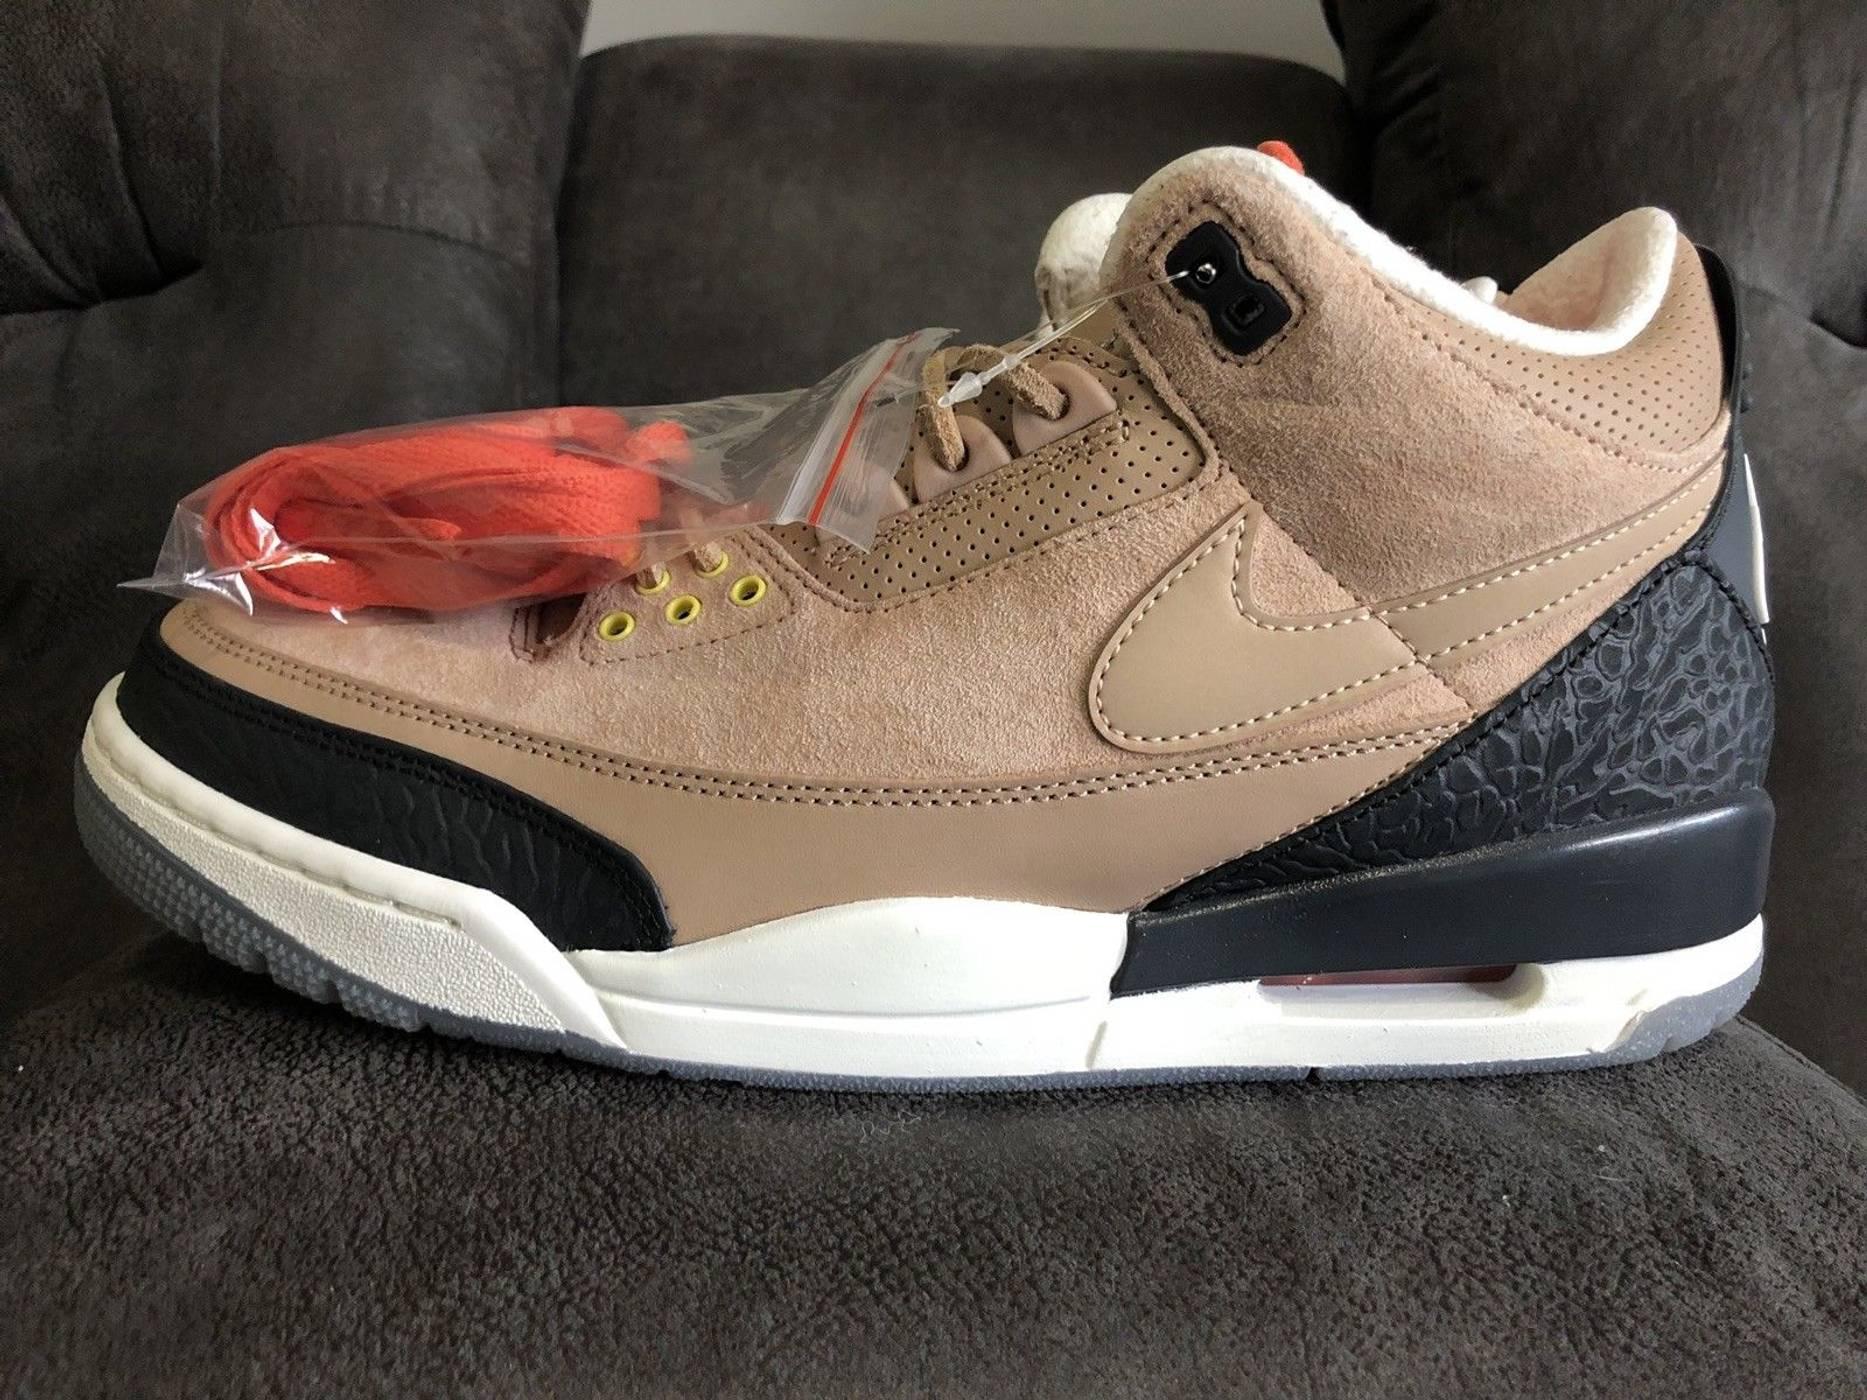 super popular d43ef 55f02 Nike Air Jordan 3 Vintage JTH Bio Beige NRG Tinker Hatfield ...